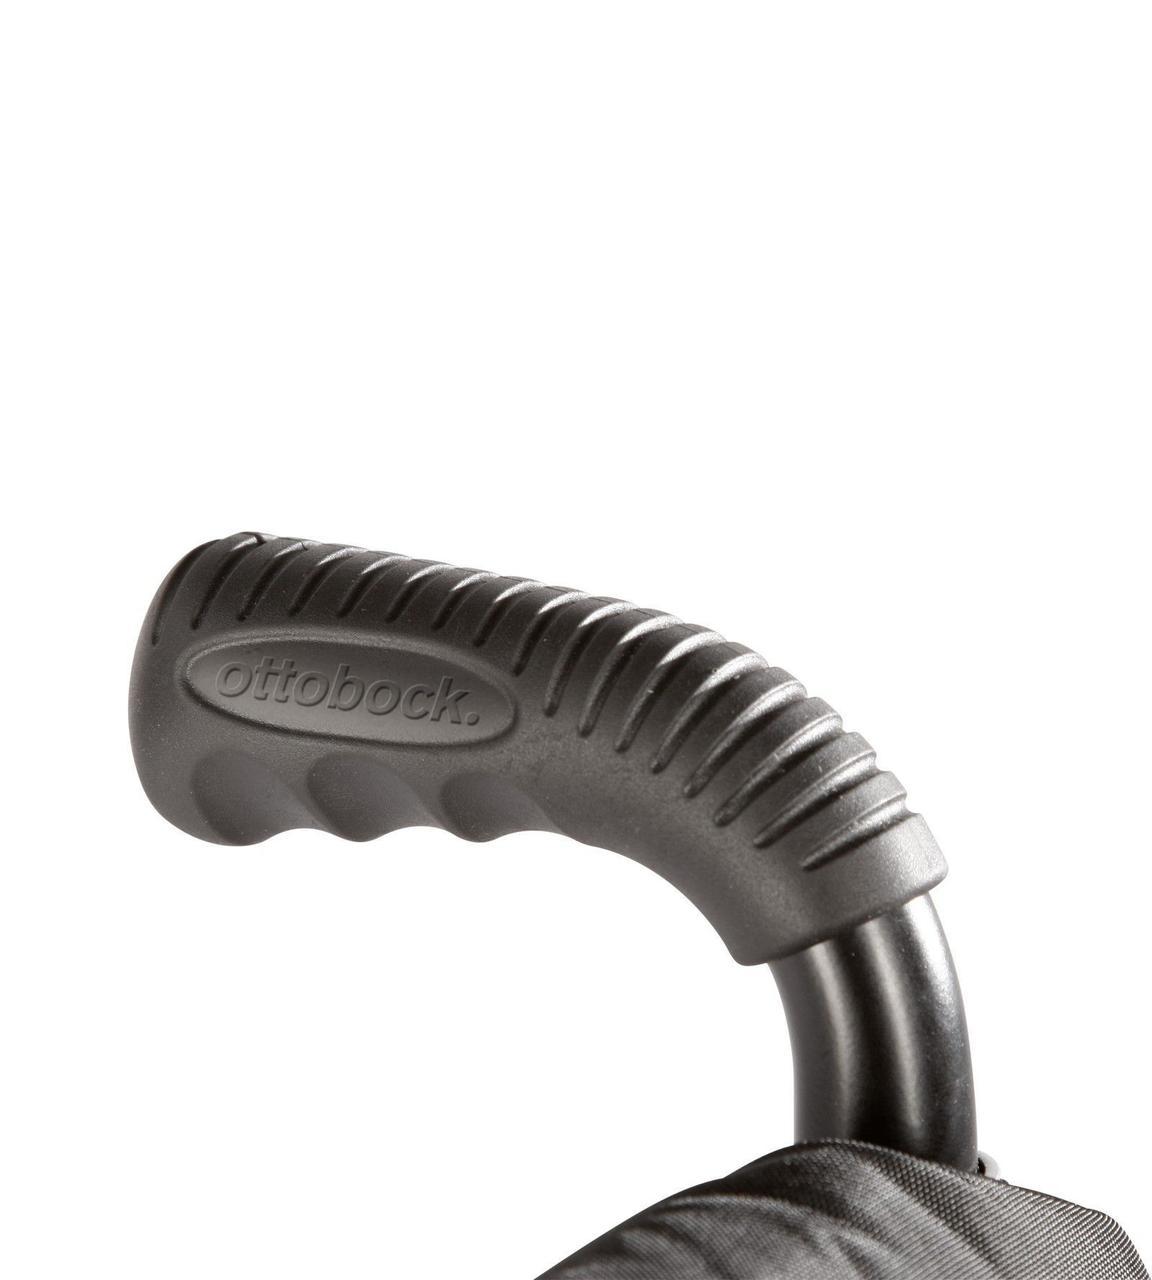 Кресло-коляска Otto Bock АВАНГАРД ТИН активного типа для детей и подростков - фото 8